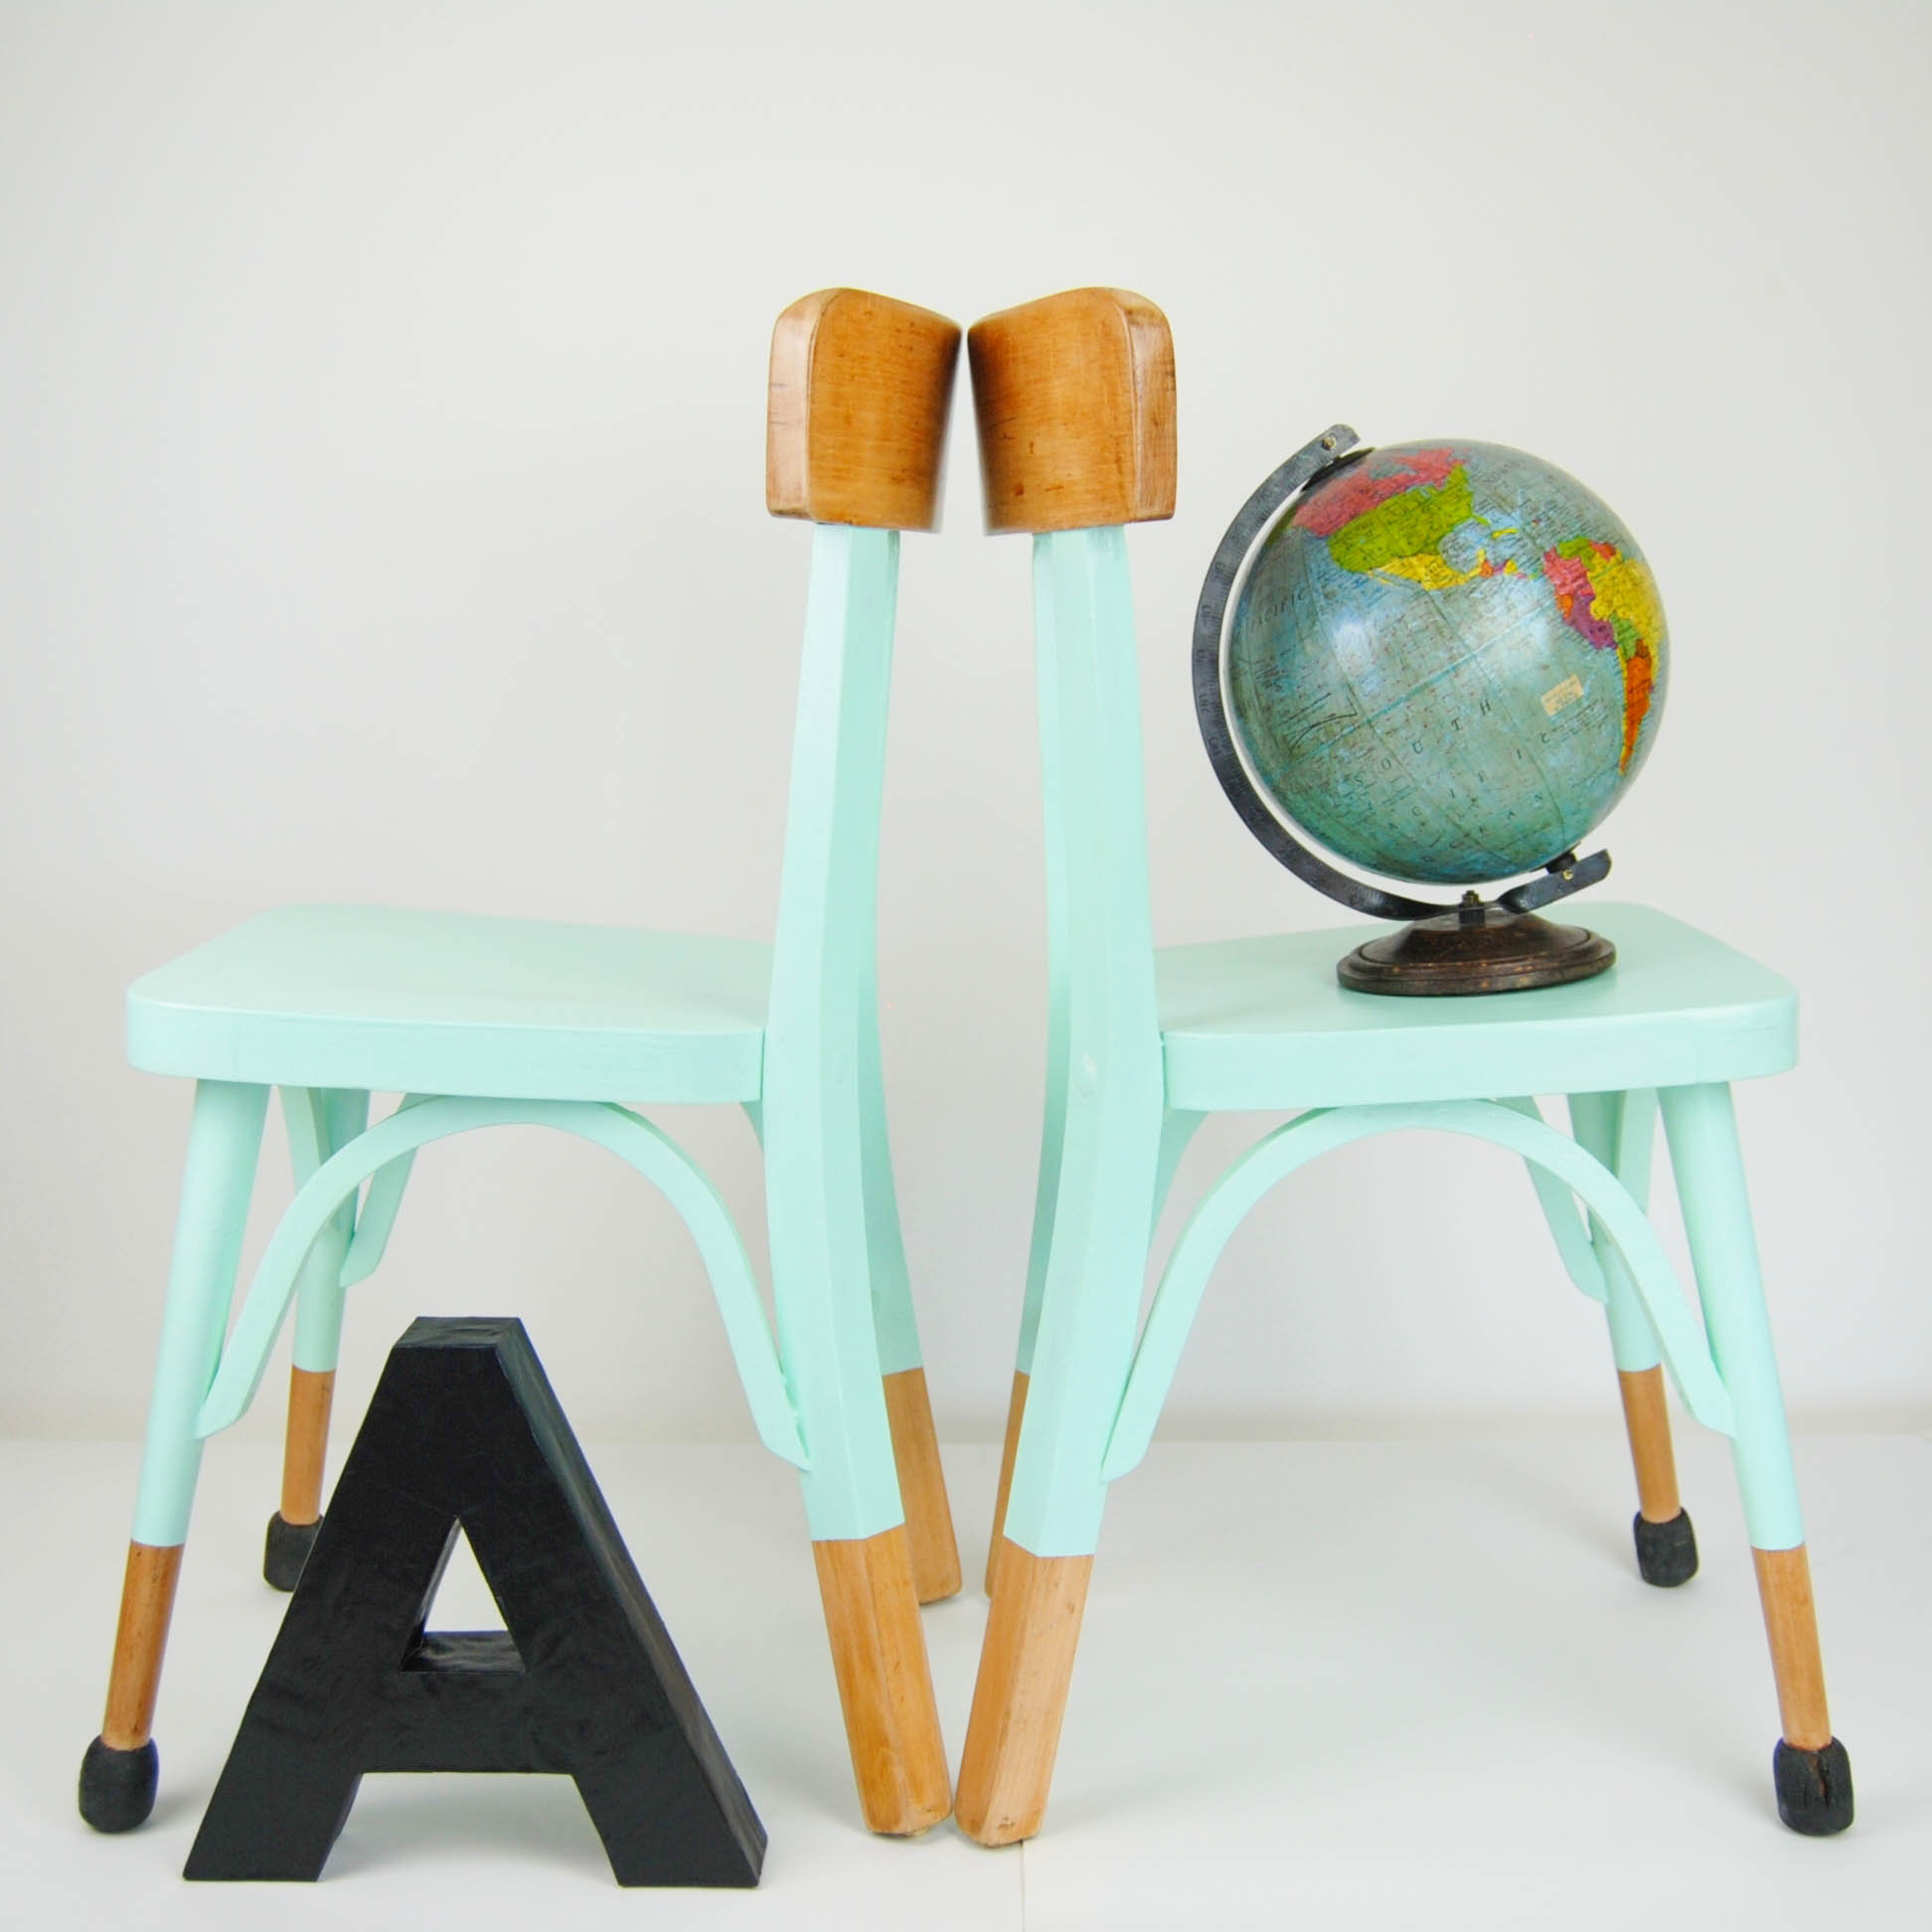 Restauraci N De Muebles En Girona Muebles Personalizados  # Muebles Personalizados